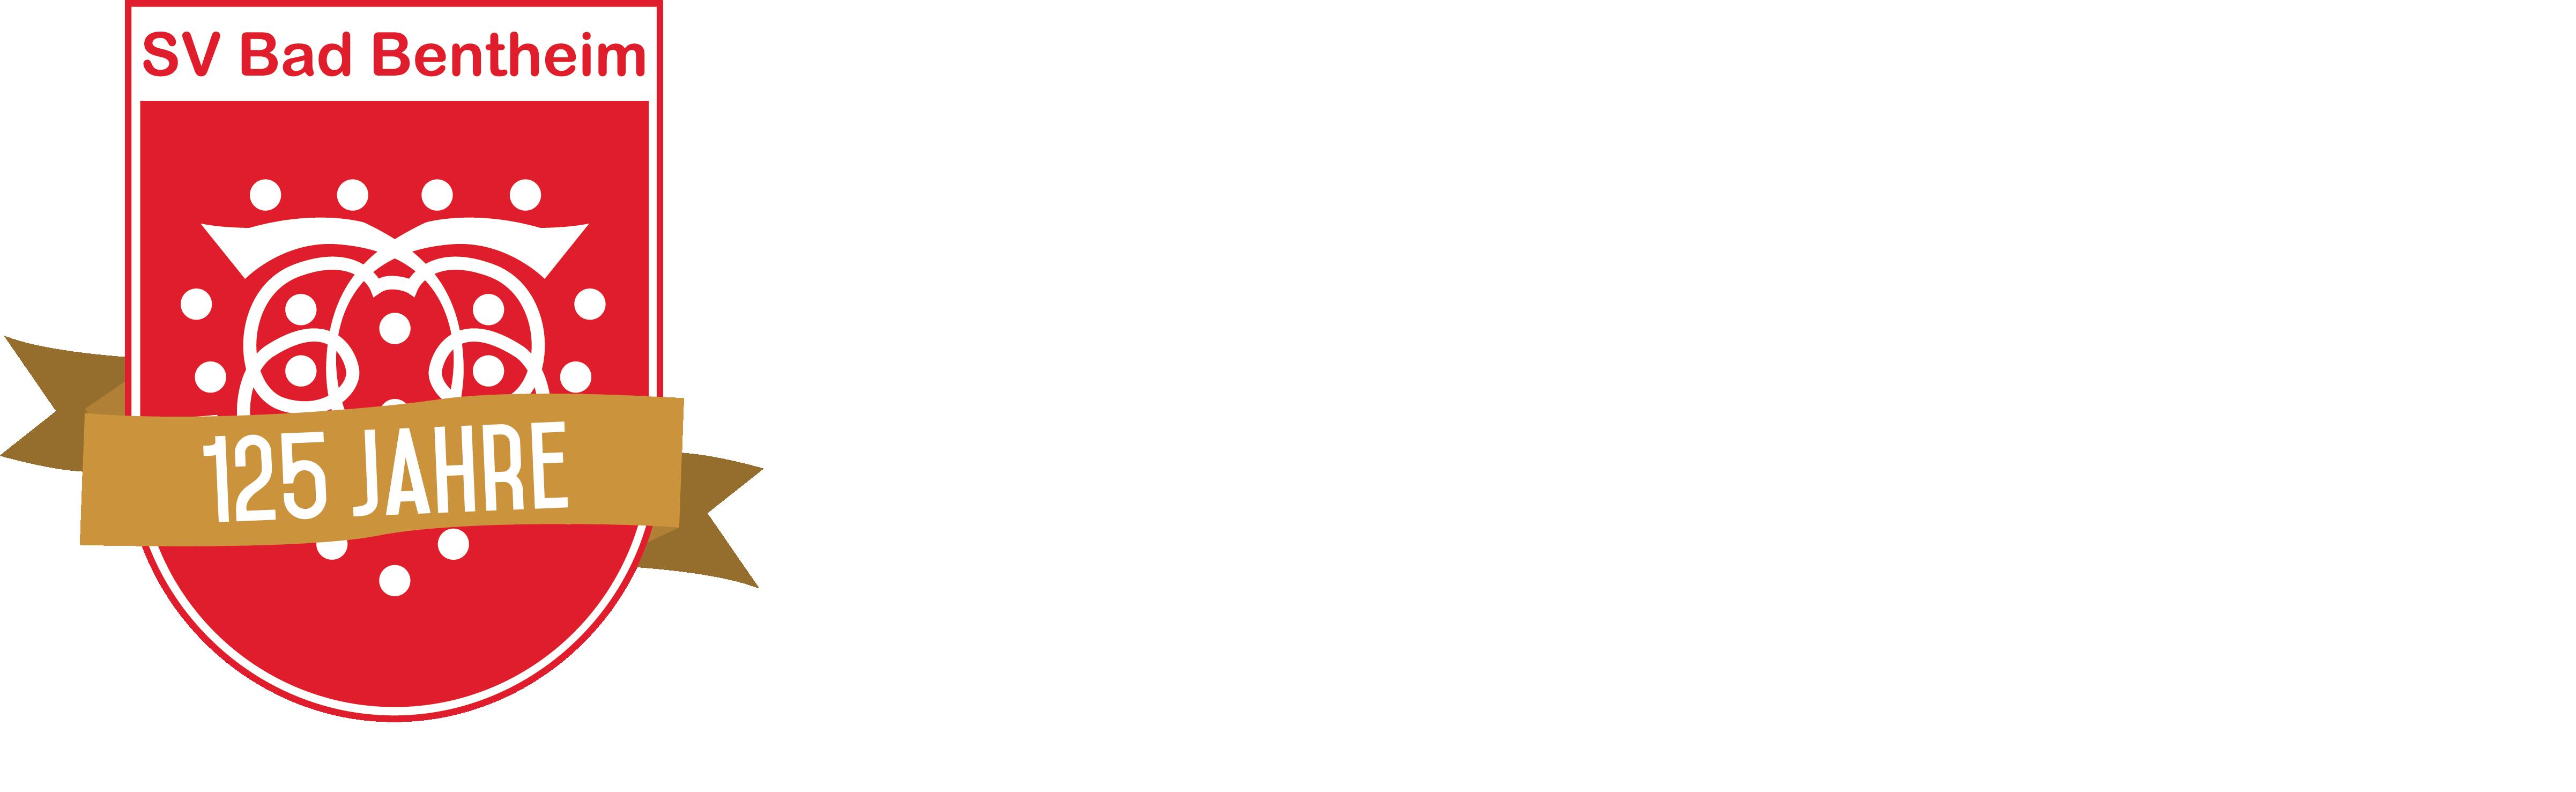 SV Bad Bentheim